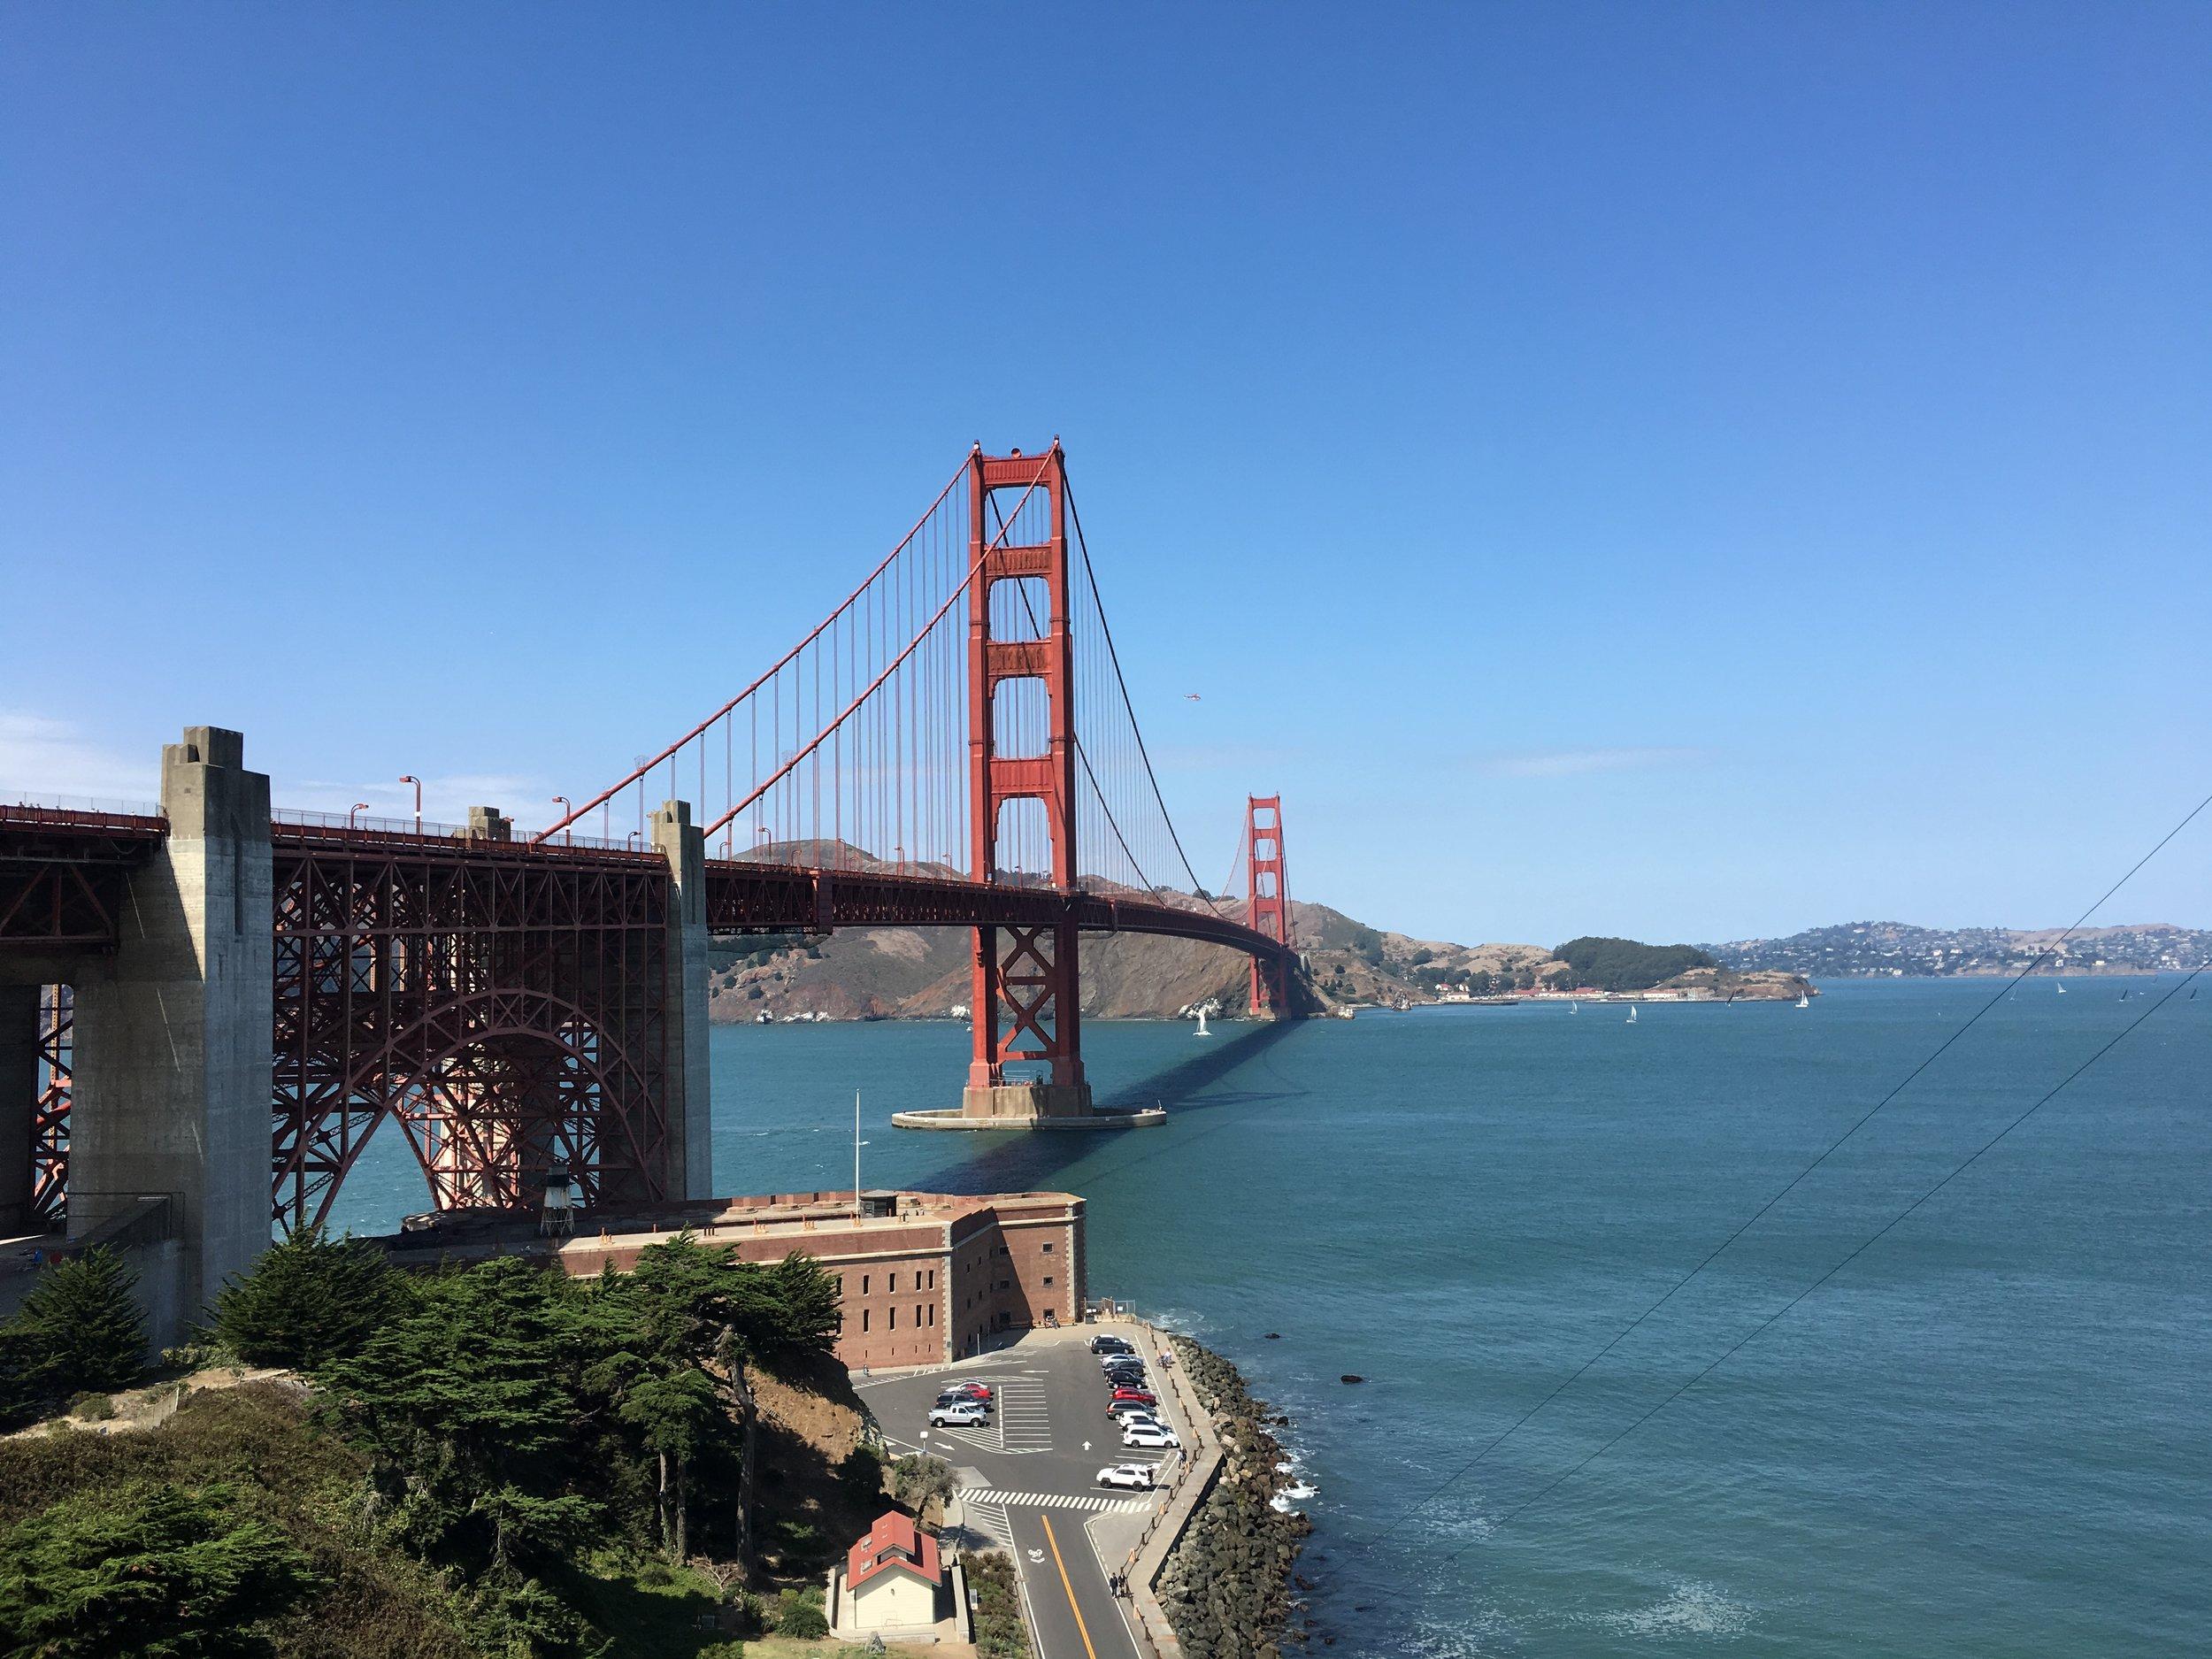 Bike path to the Golden Gate Bridge